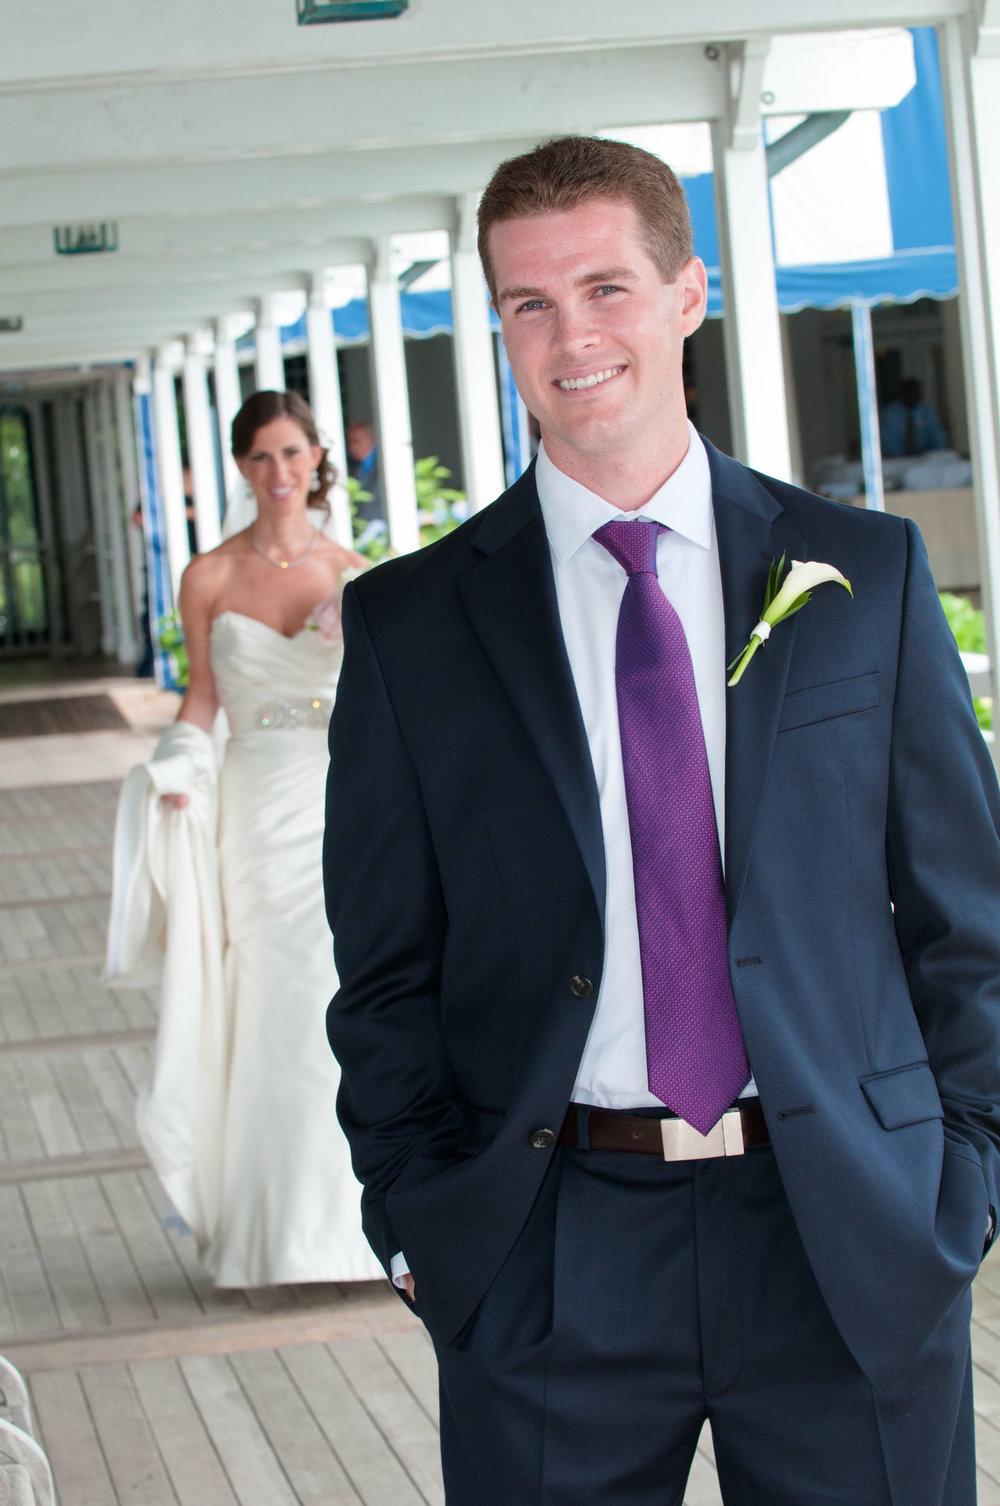 Wedding08DSC_1016-2.jpg